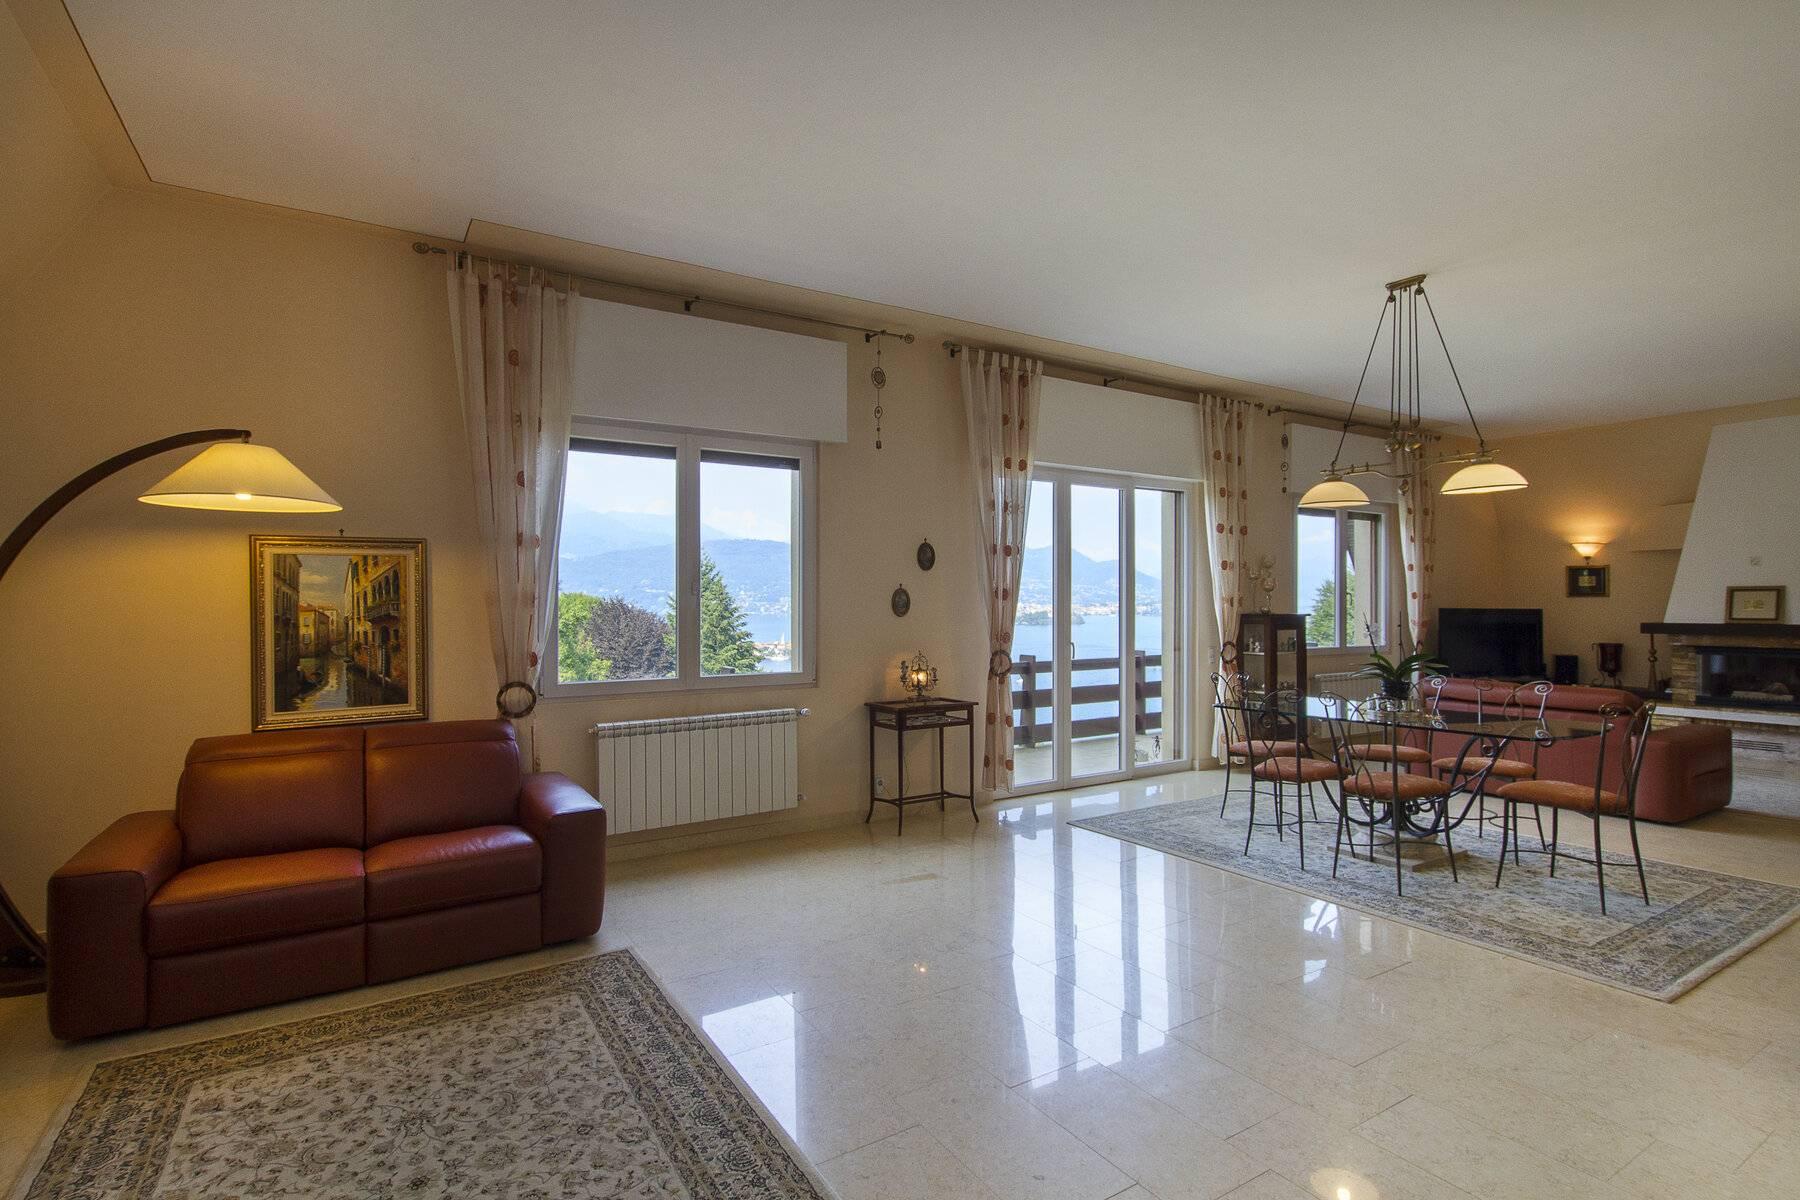 Villa in Vendita a Stresa: 5 locali, 364 mq - Foto 18